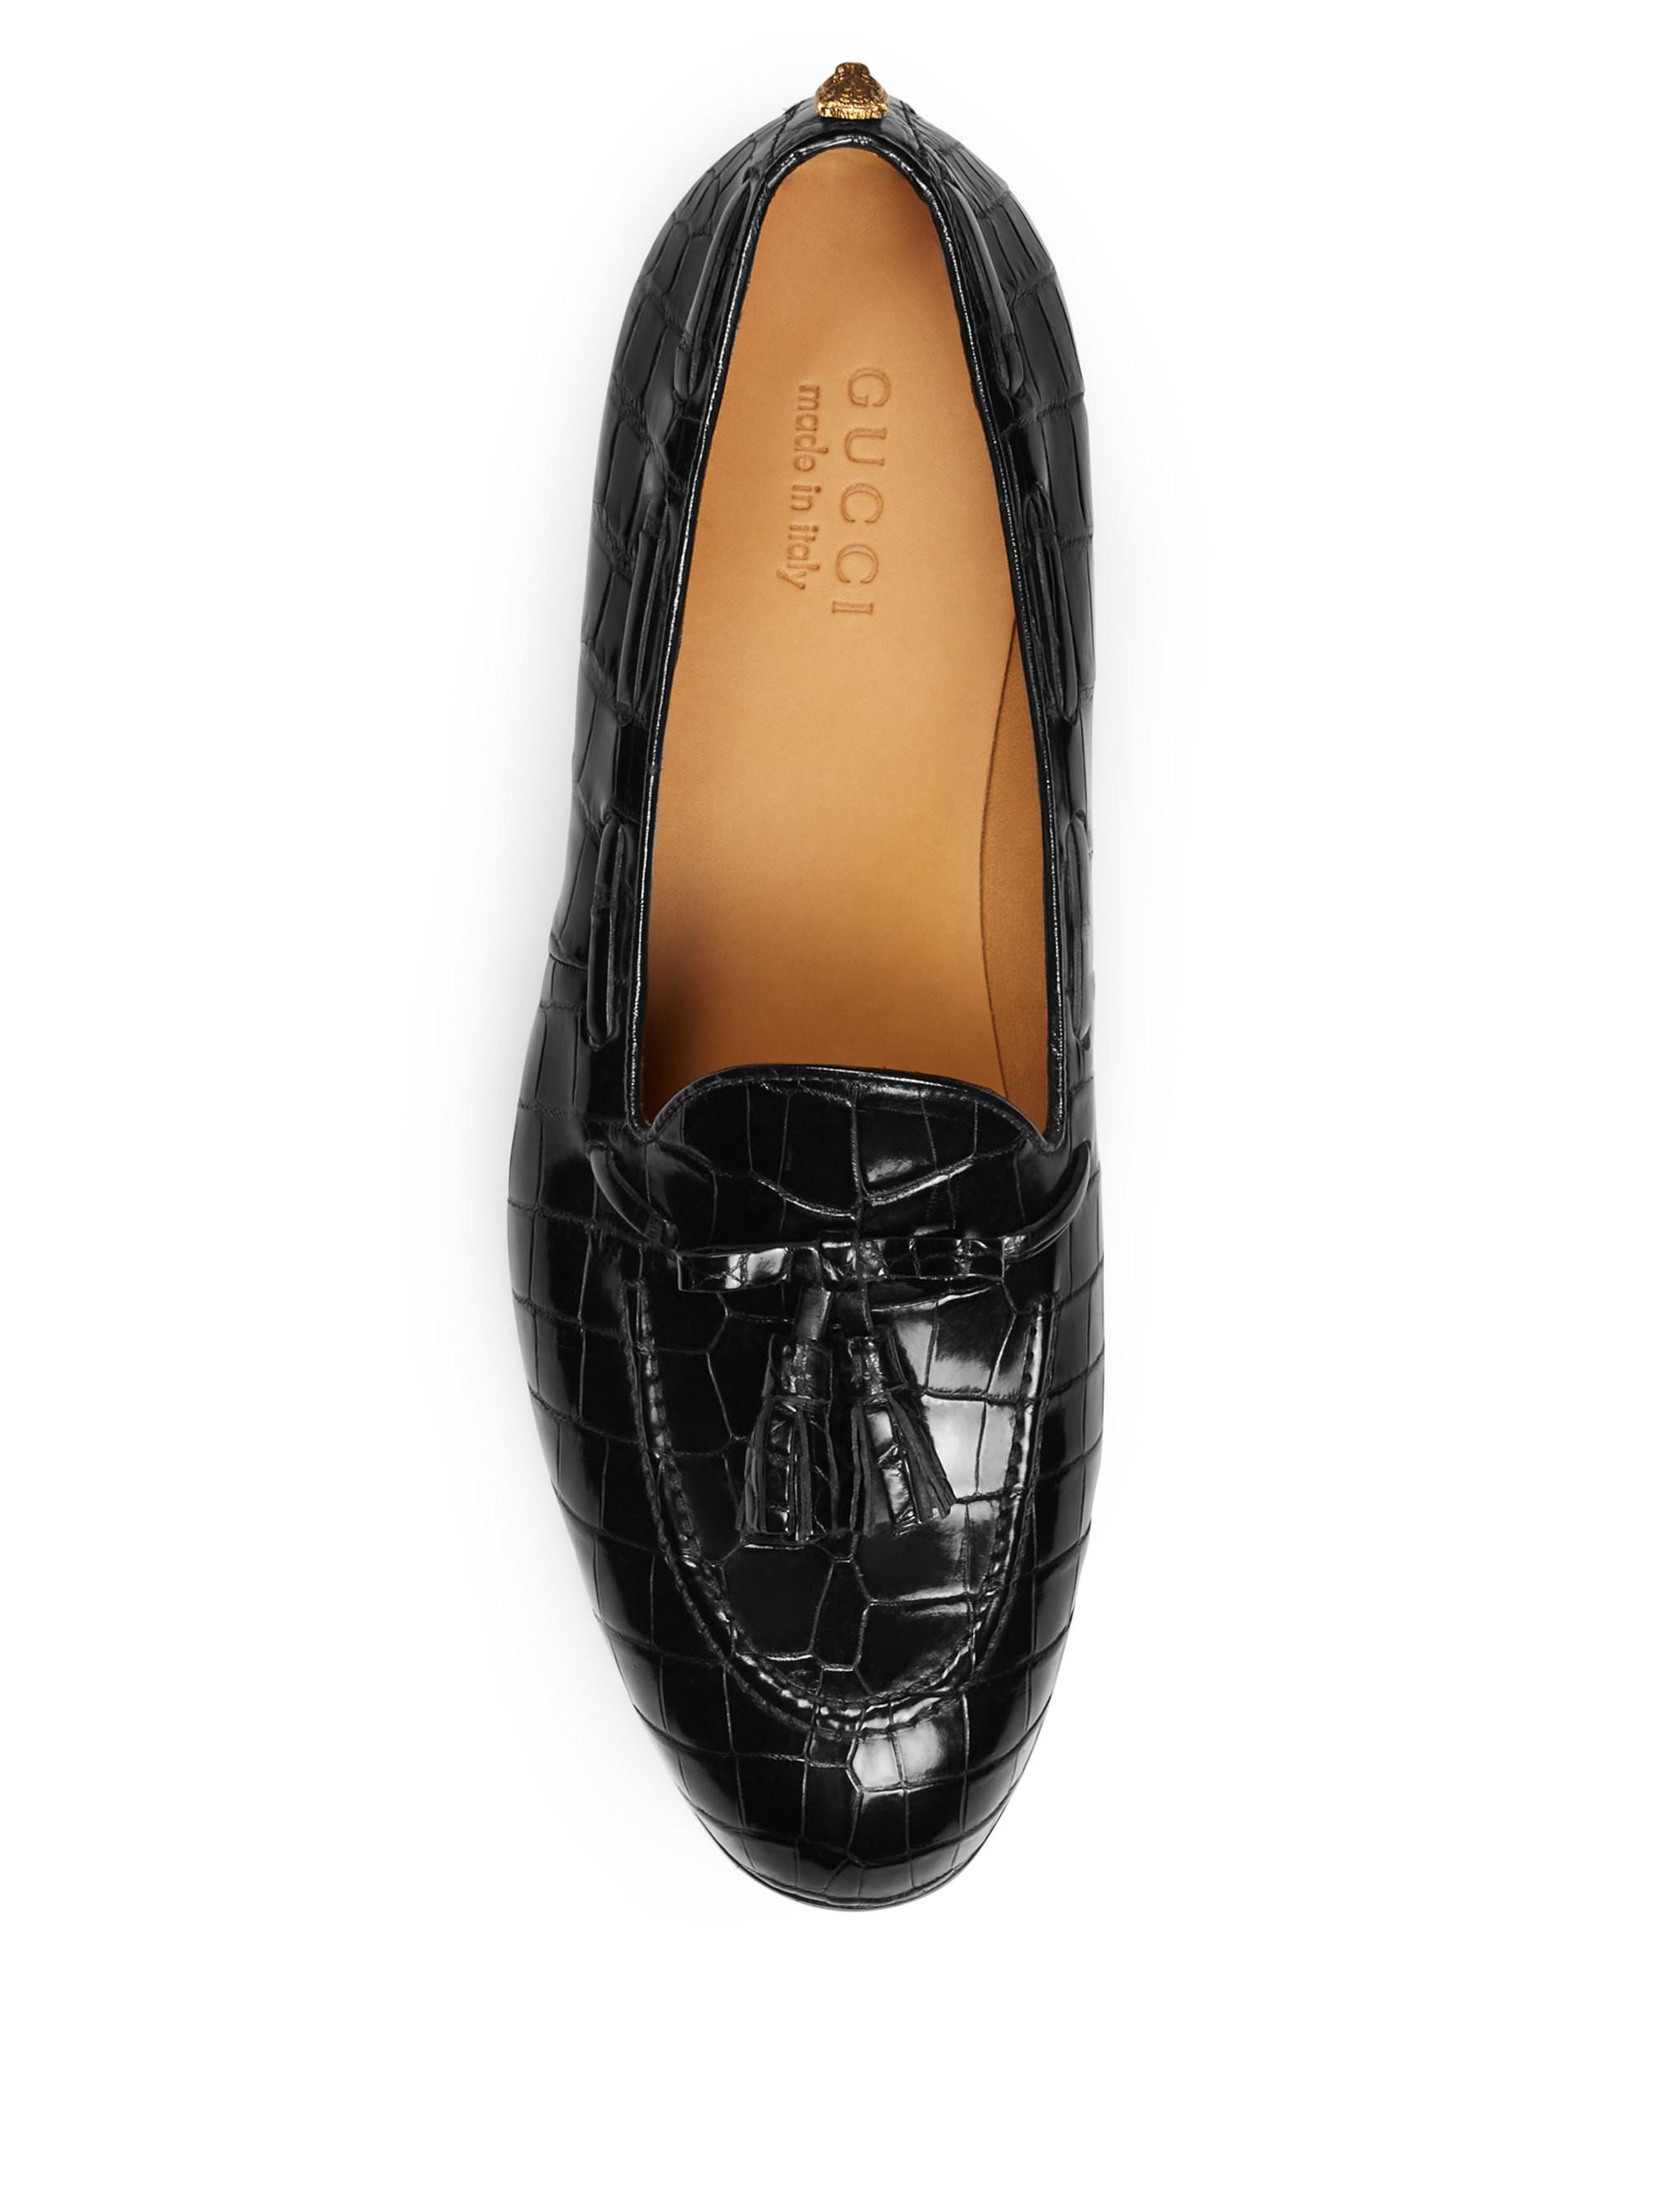 189a69efebf Gucci Men's Crocodile Tassel Loafers - Black - Size 9.5 Uk (10.5 Us) in  Black for Men - Lyst